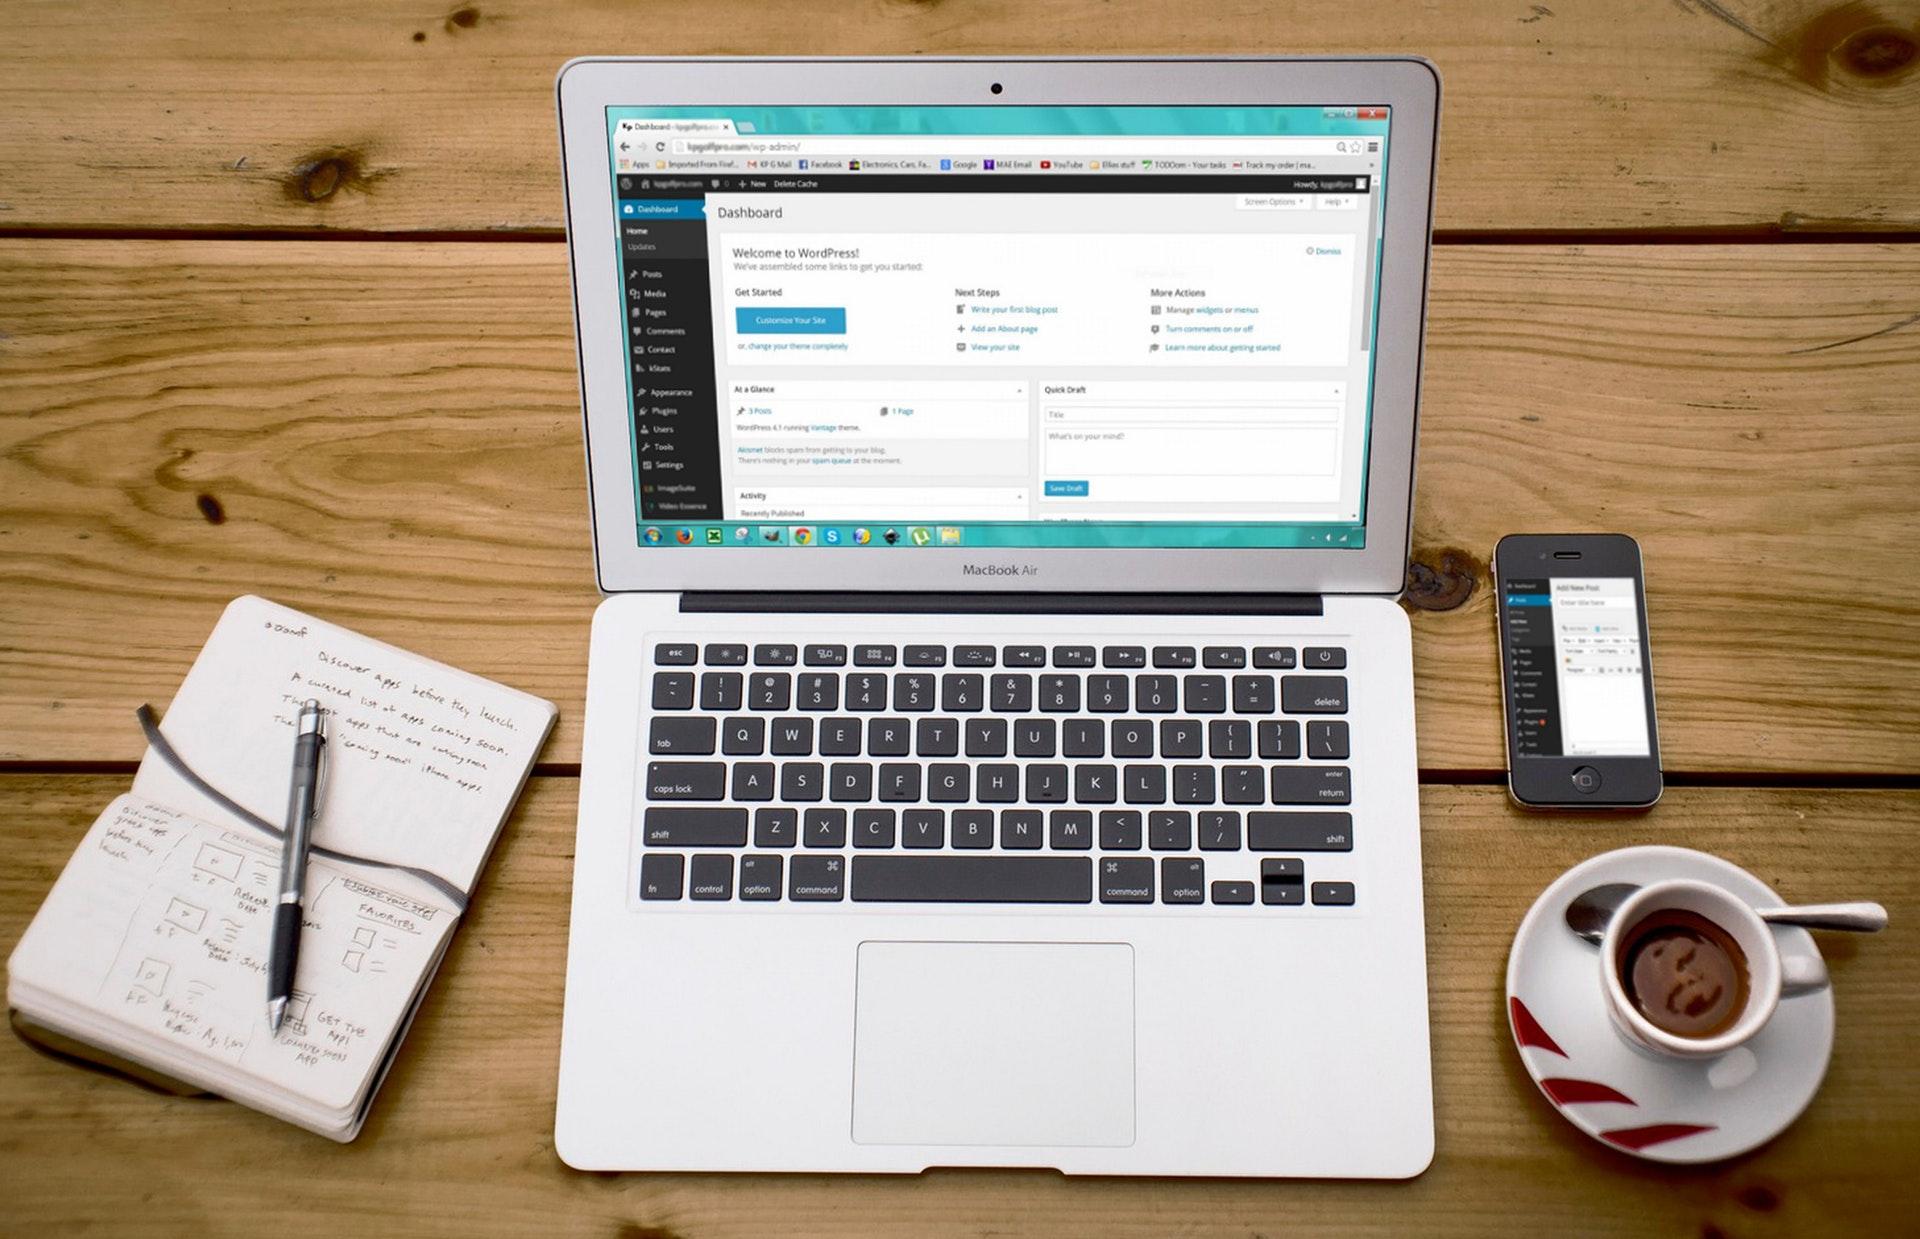 Pregateste-te sa scrii o postare de blog grozava